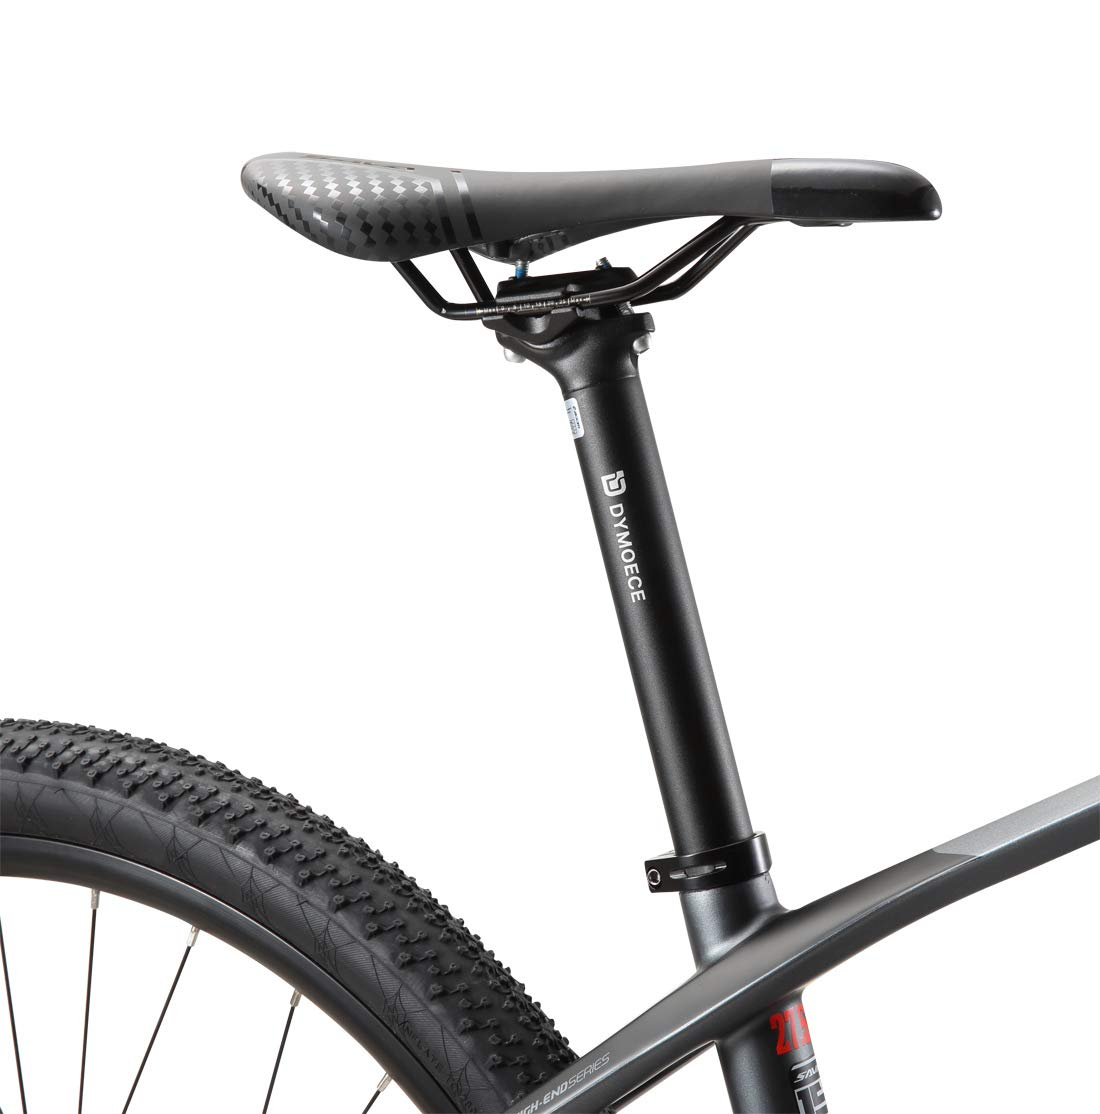 FOMTOR Bike Seatpost 27.2//30.9//31.6 x 400mm Adjustable Long Seat Post Mountain Bike Seatpost for MTB Road Bike Folding Bike BMX